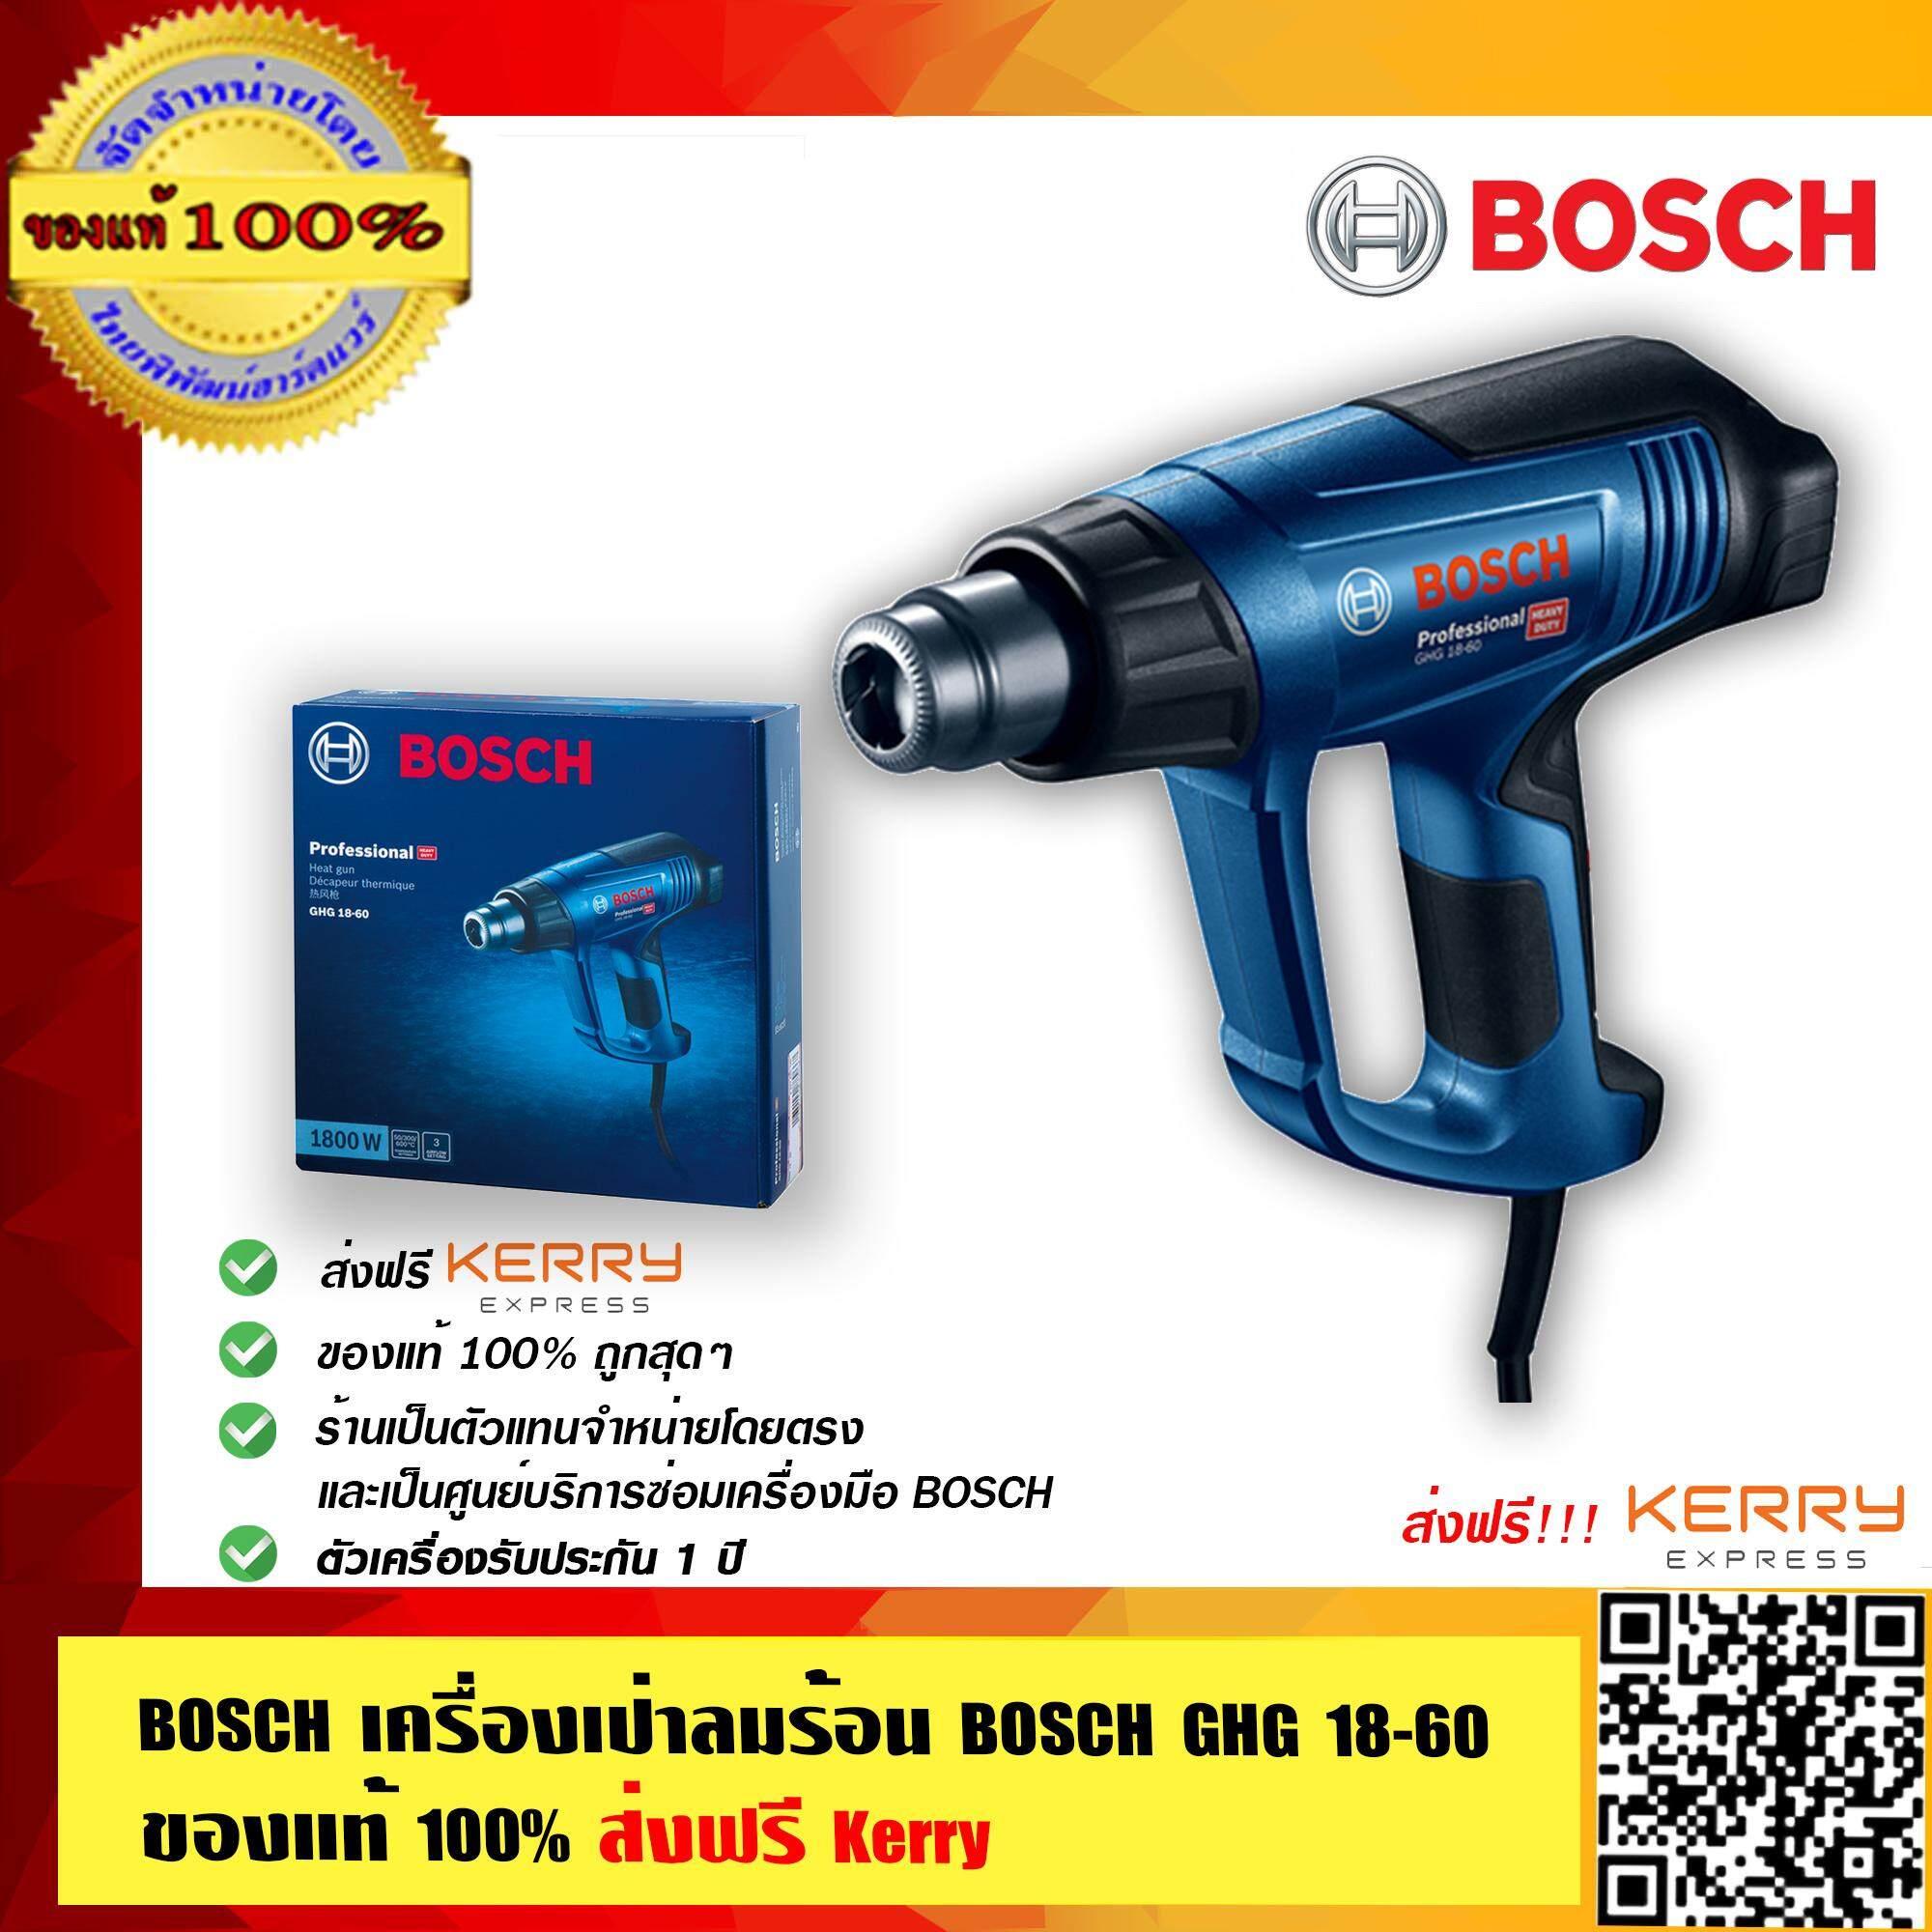 Bosch เครื่องเป่าลมร้อน Bosch Ghg 18-60 ของแท้ 100% ส่งฟรี Kerry.